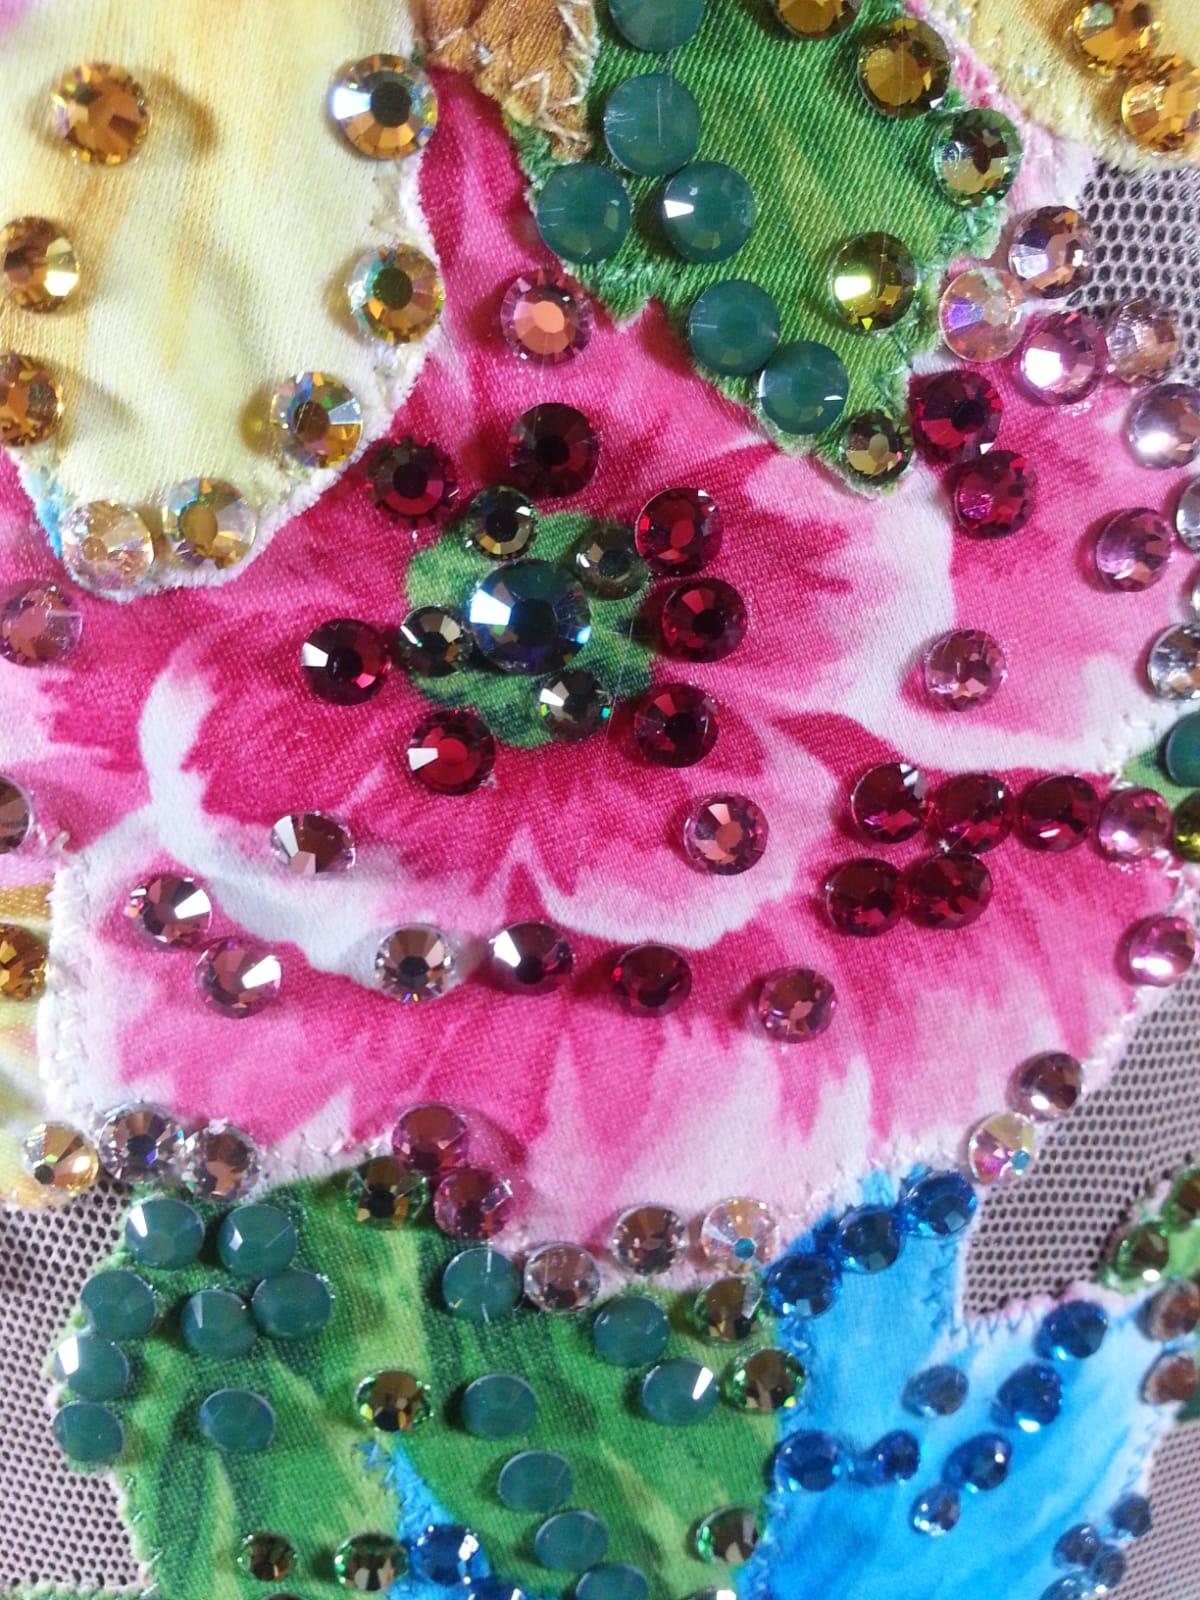 Flower detail leo 2.jpeg